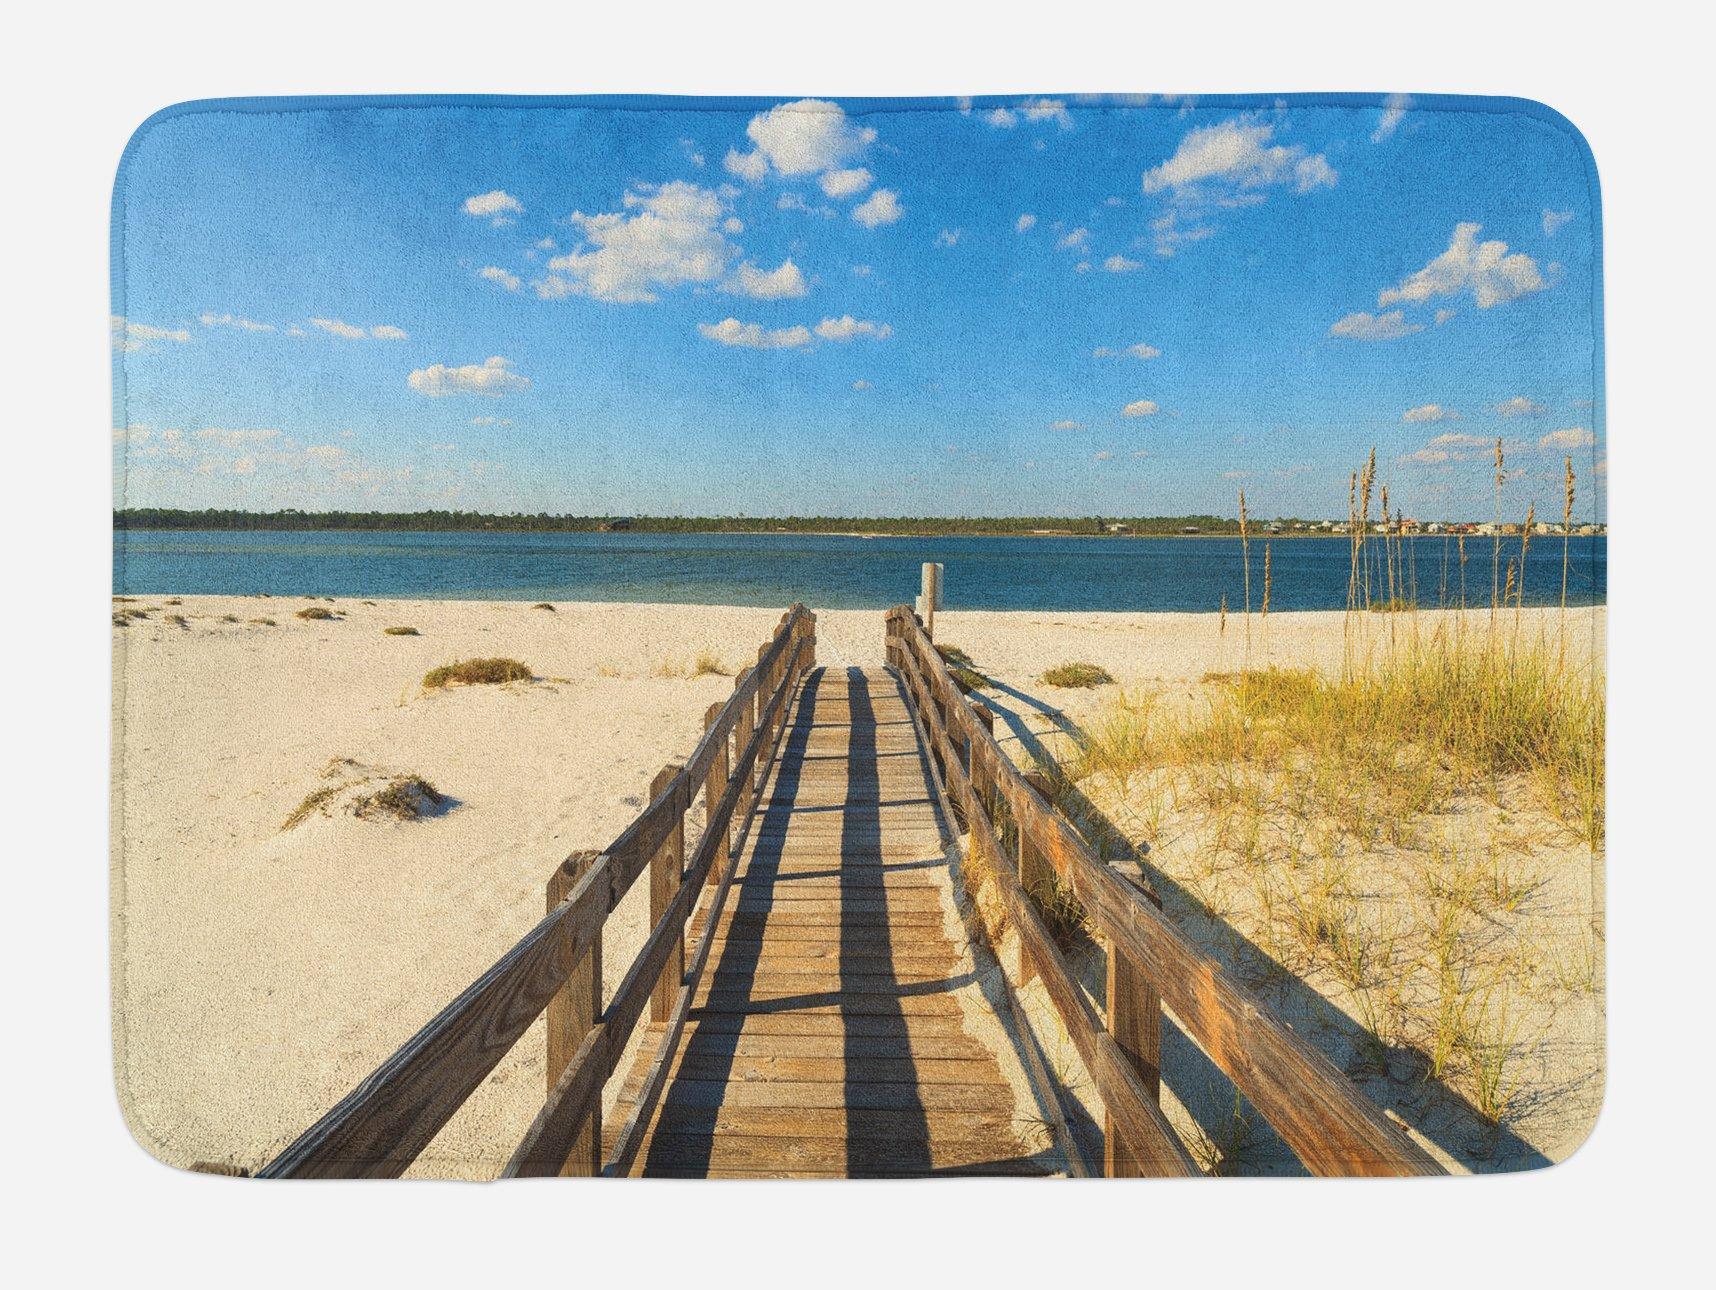 Ambesonne Beach Bath Mat, Perdido Beach and Long Pier Deck Over Sand Gulf of Mexico South America Resort Theme, Plush Bathroom Decor Mat with Non Slip Backing, 29.5 W X 17.5 W Inches, Cream Blue